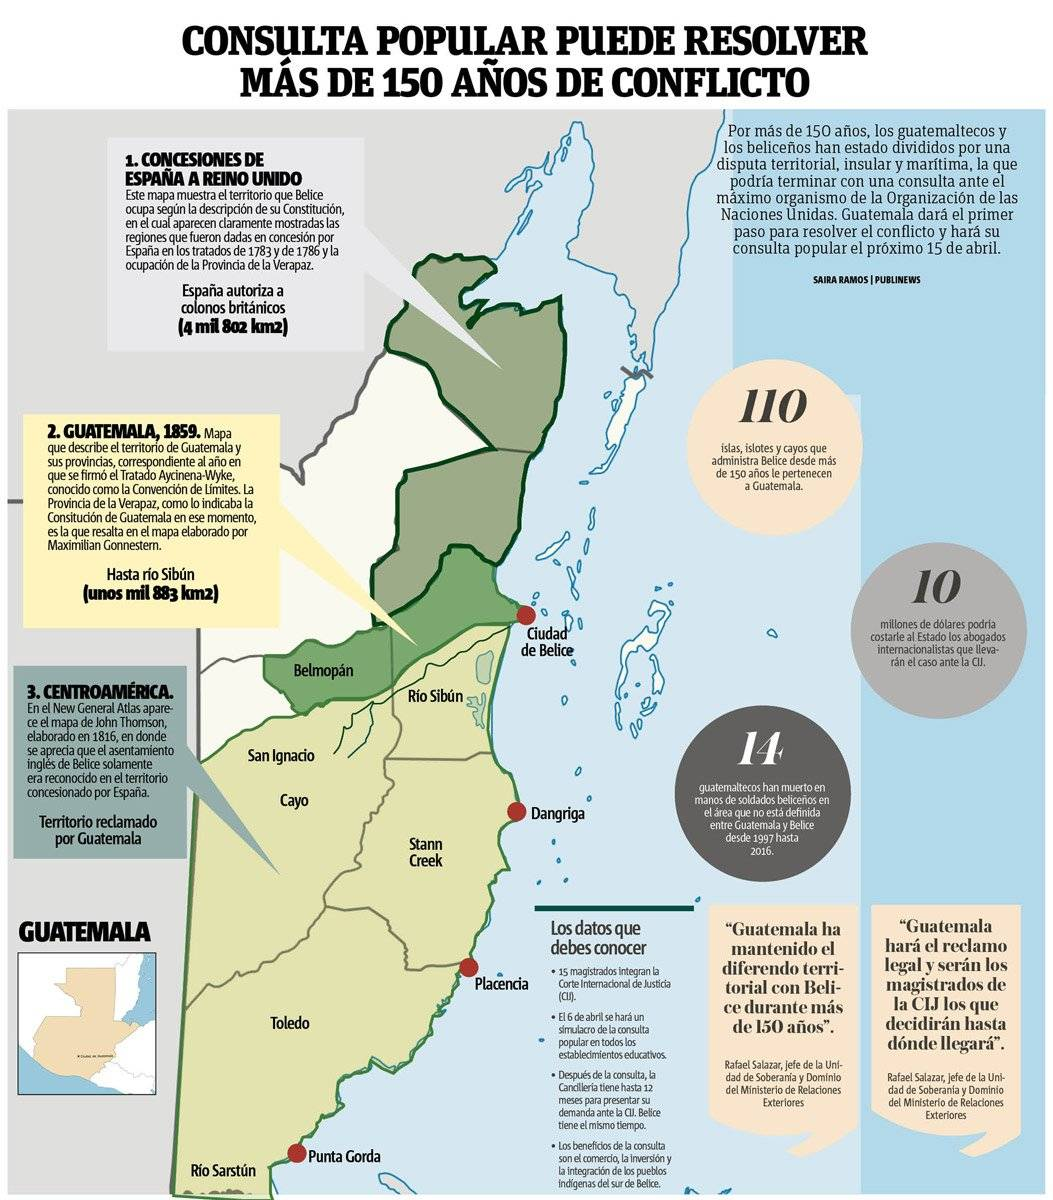 Infografía de Consulta Popular